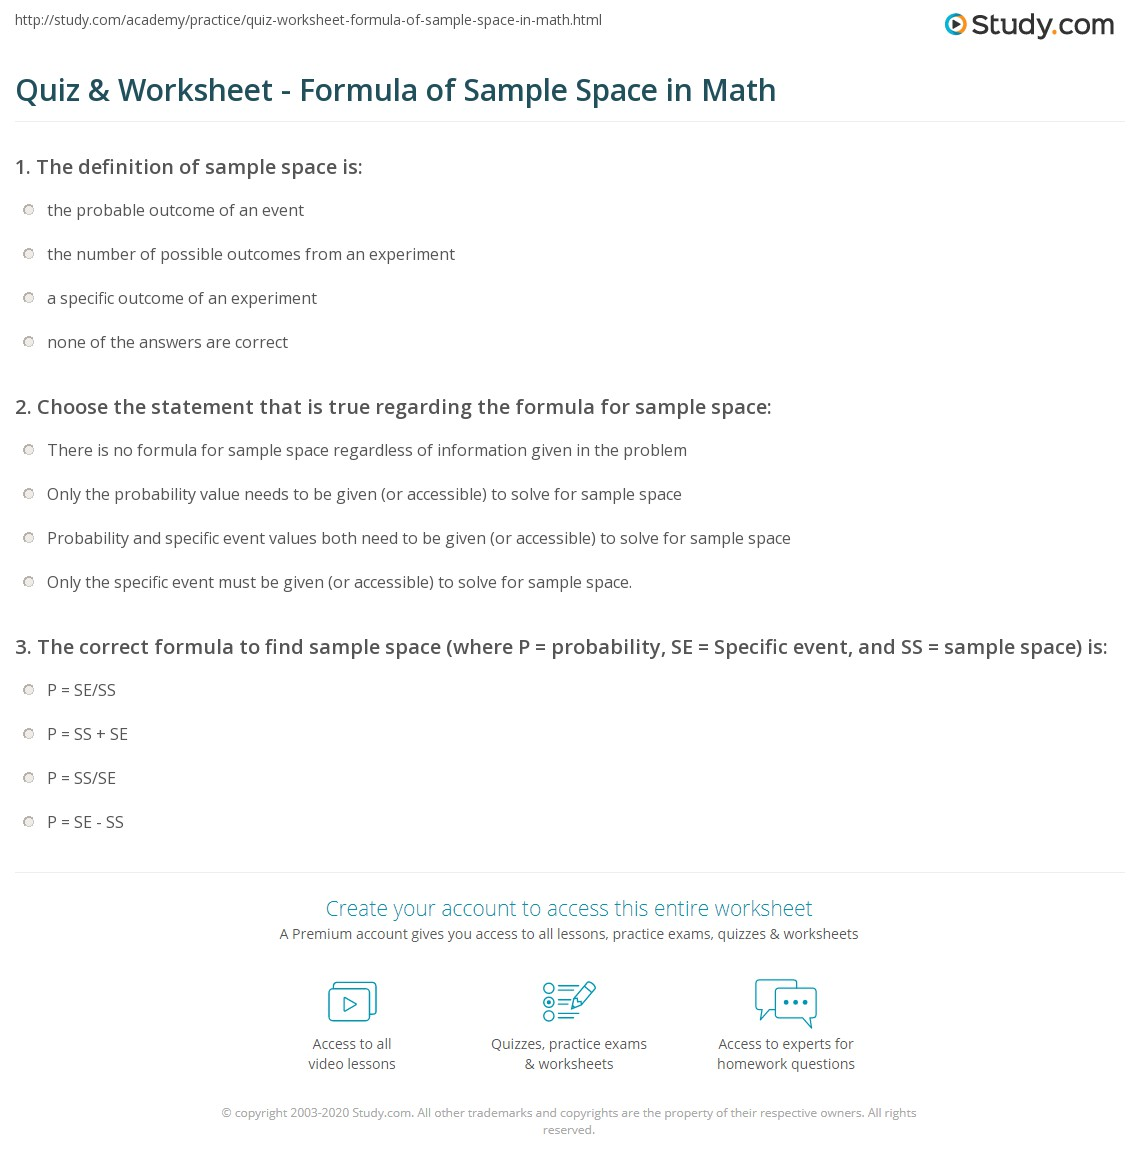 Worksheets Sample Space Worksheet quiz worksheet formula of sample space in math study com print worksheet